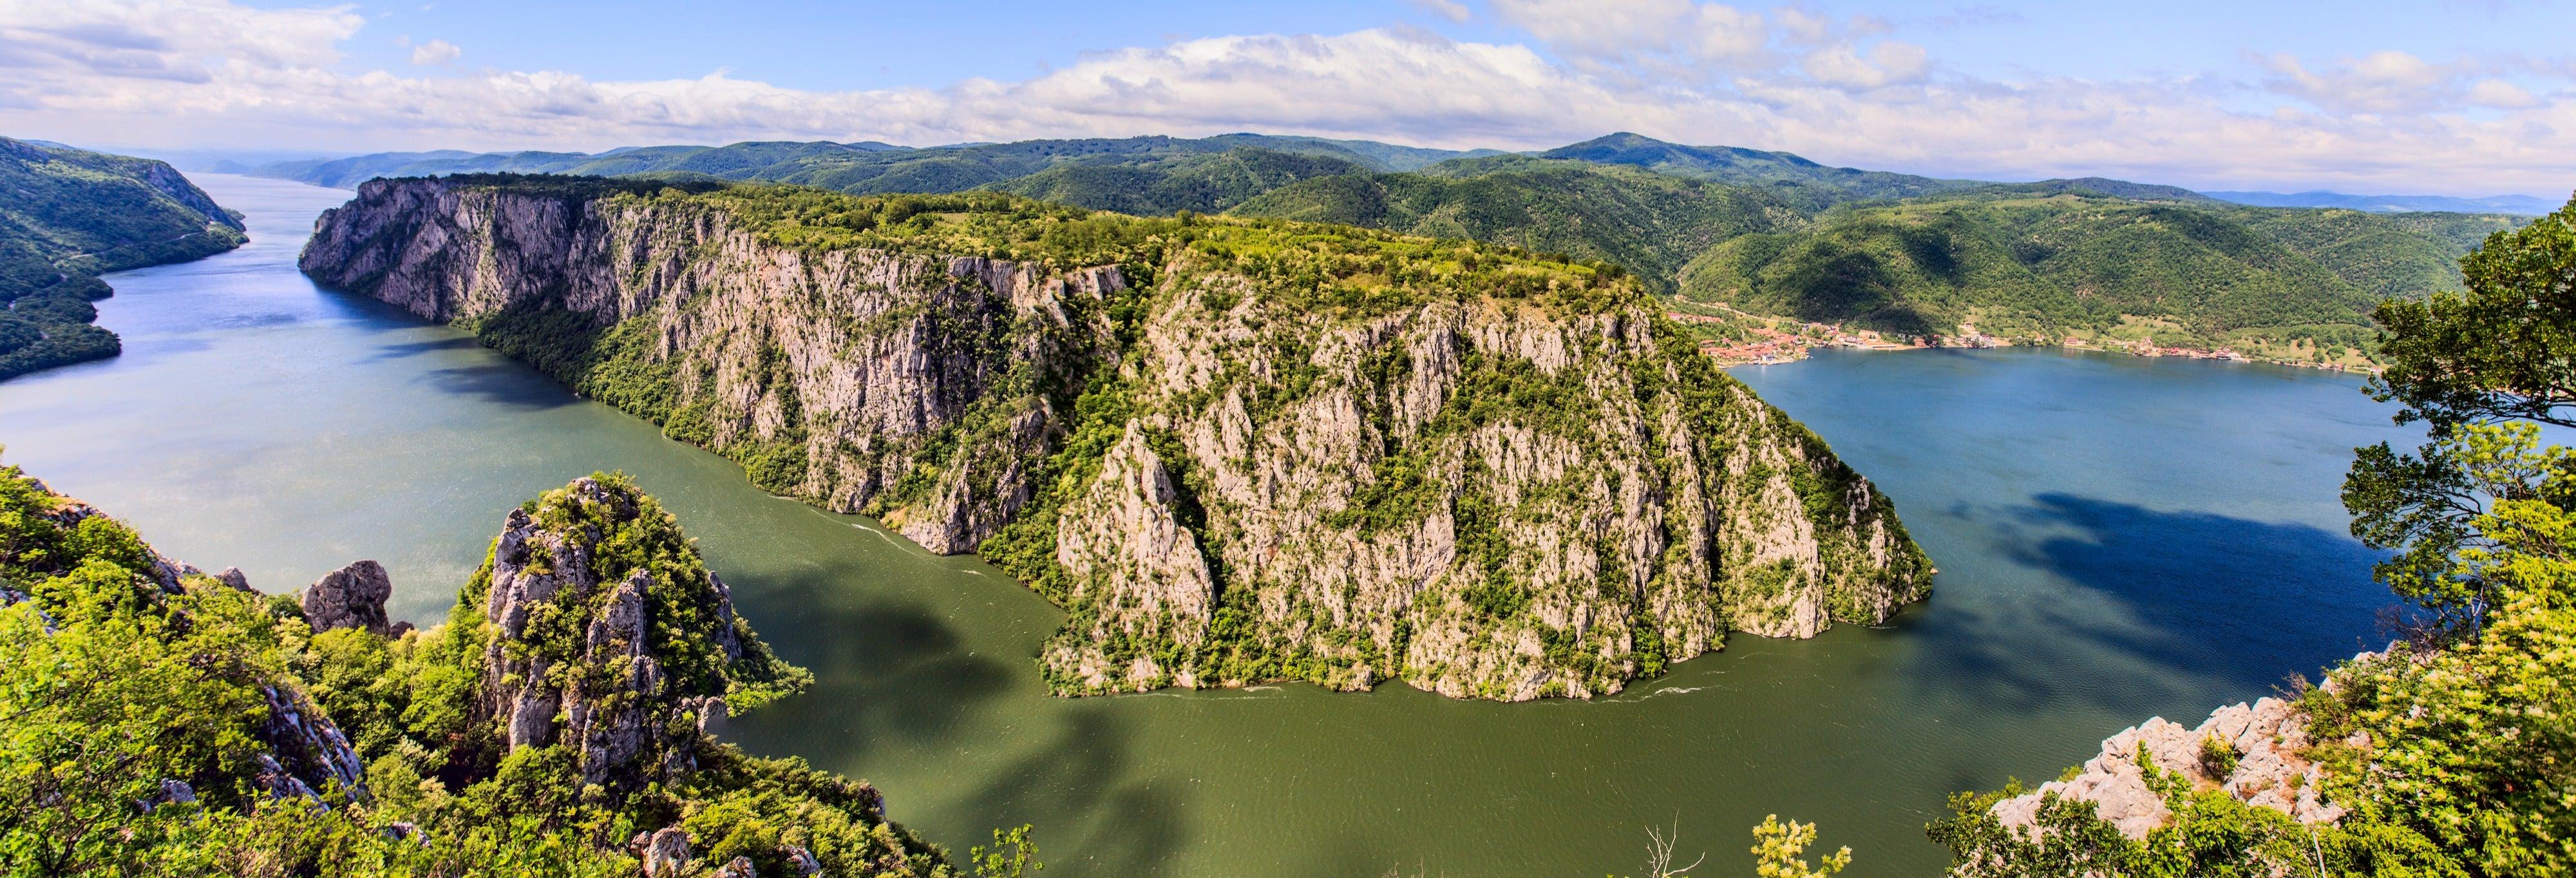 Danube Valley Trip